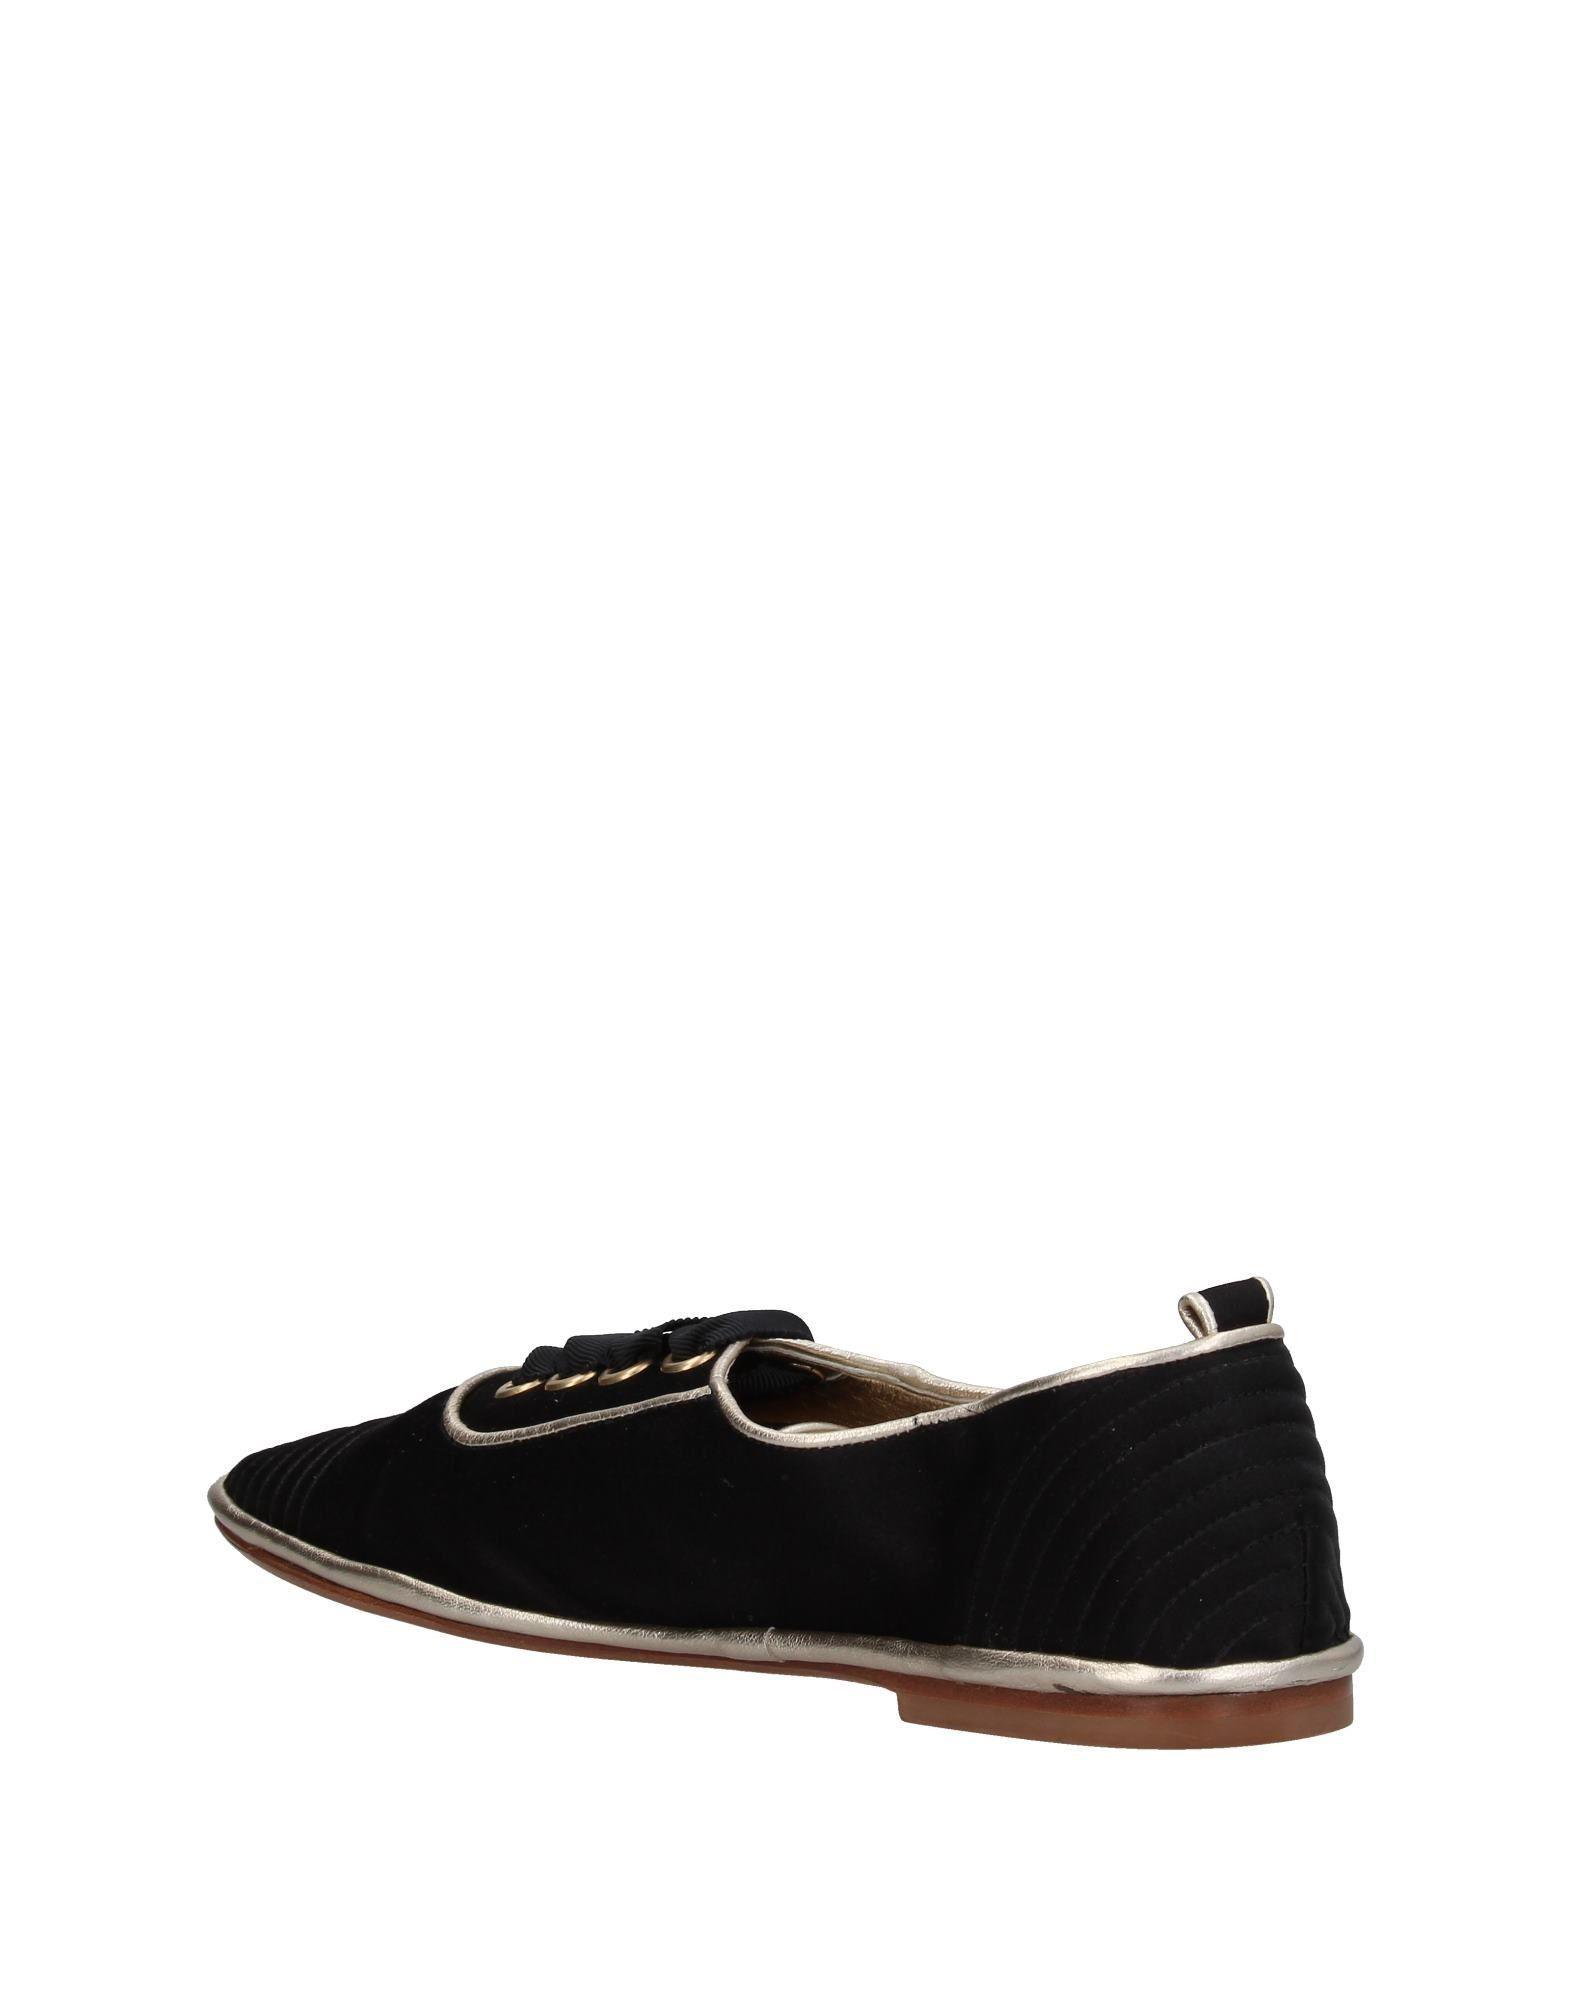 Chaussures - Bas-tops Et Chaussures De Sport Sonia Rykiel I4BOSa23S9